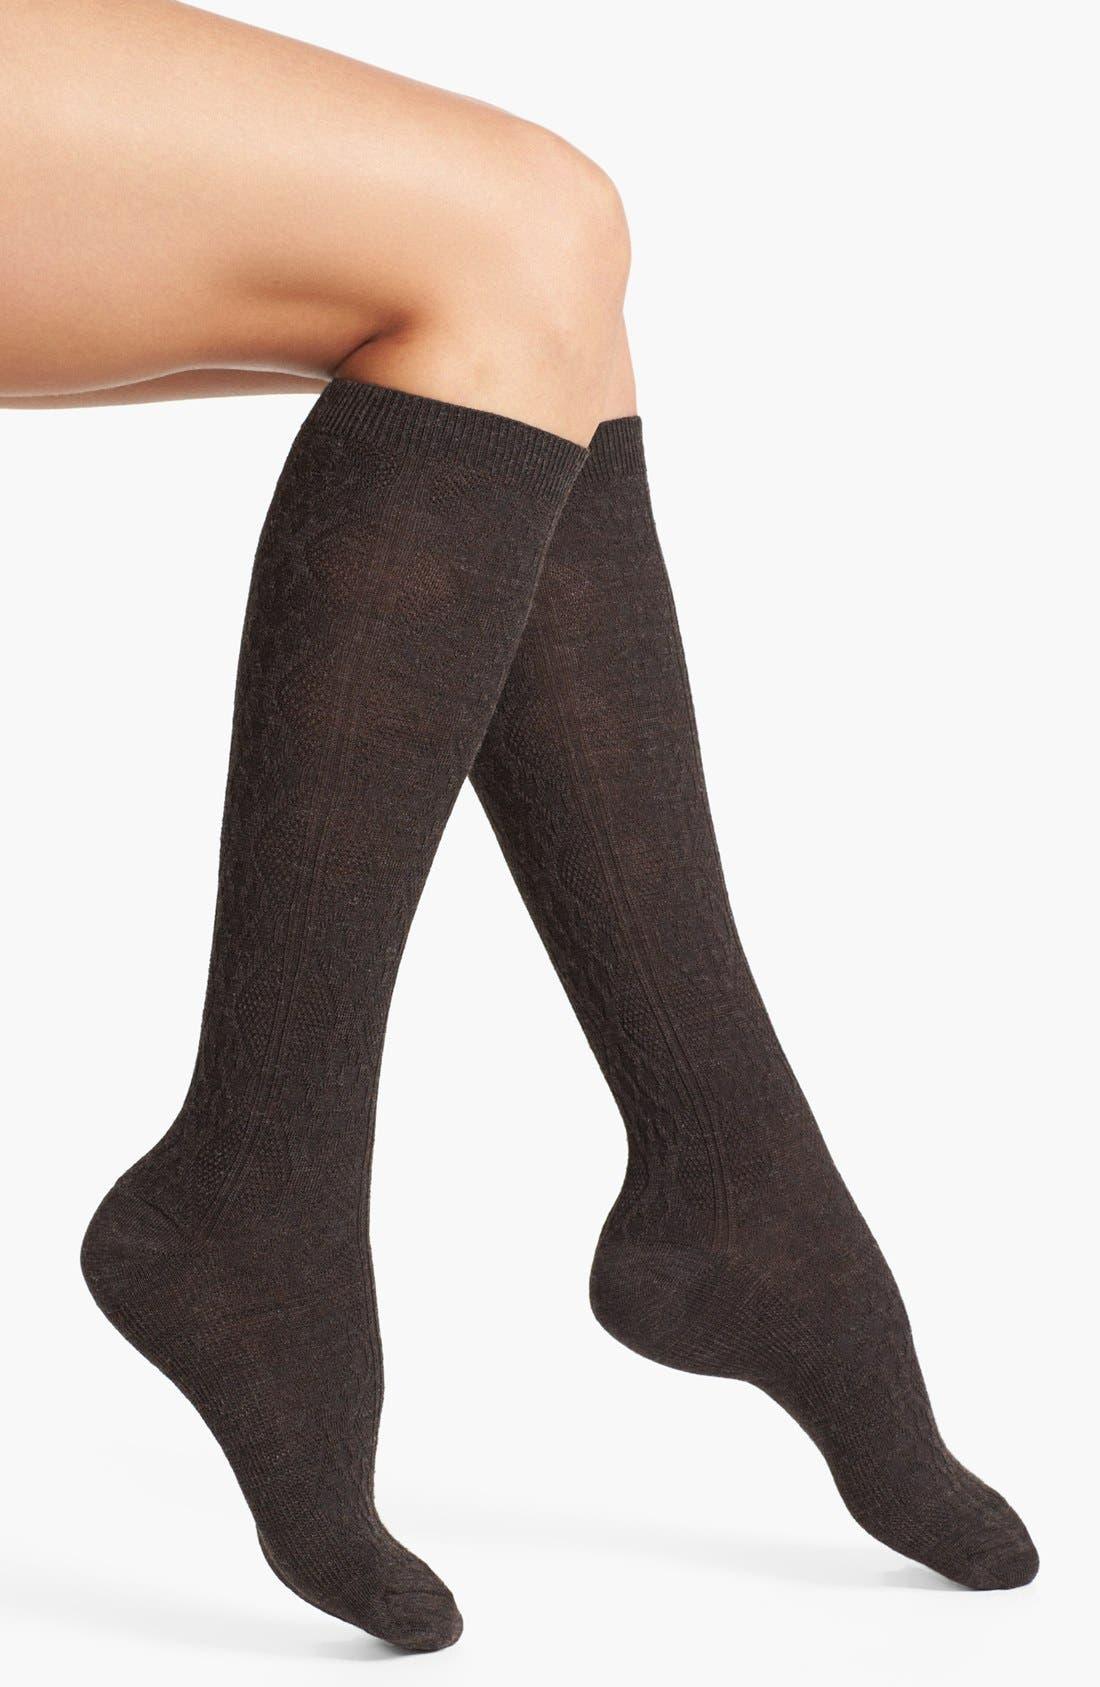 Main Image - Smartwool 'Trellis' Wool Blend Knee Highs